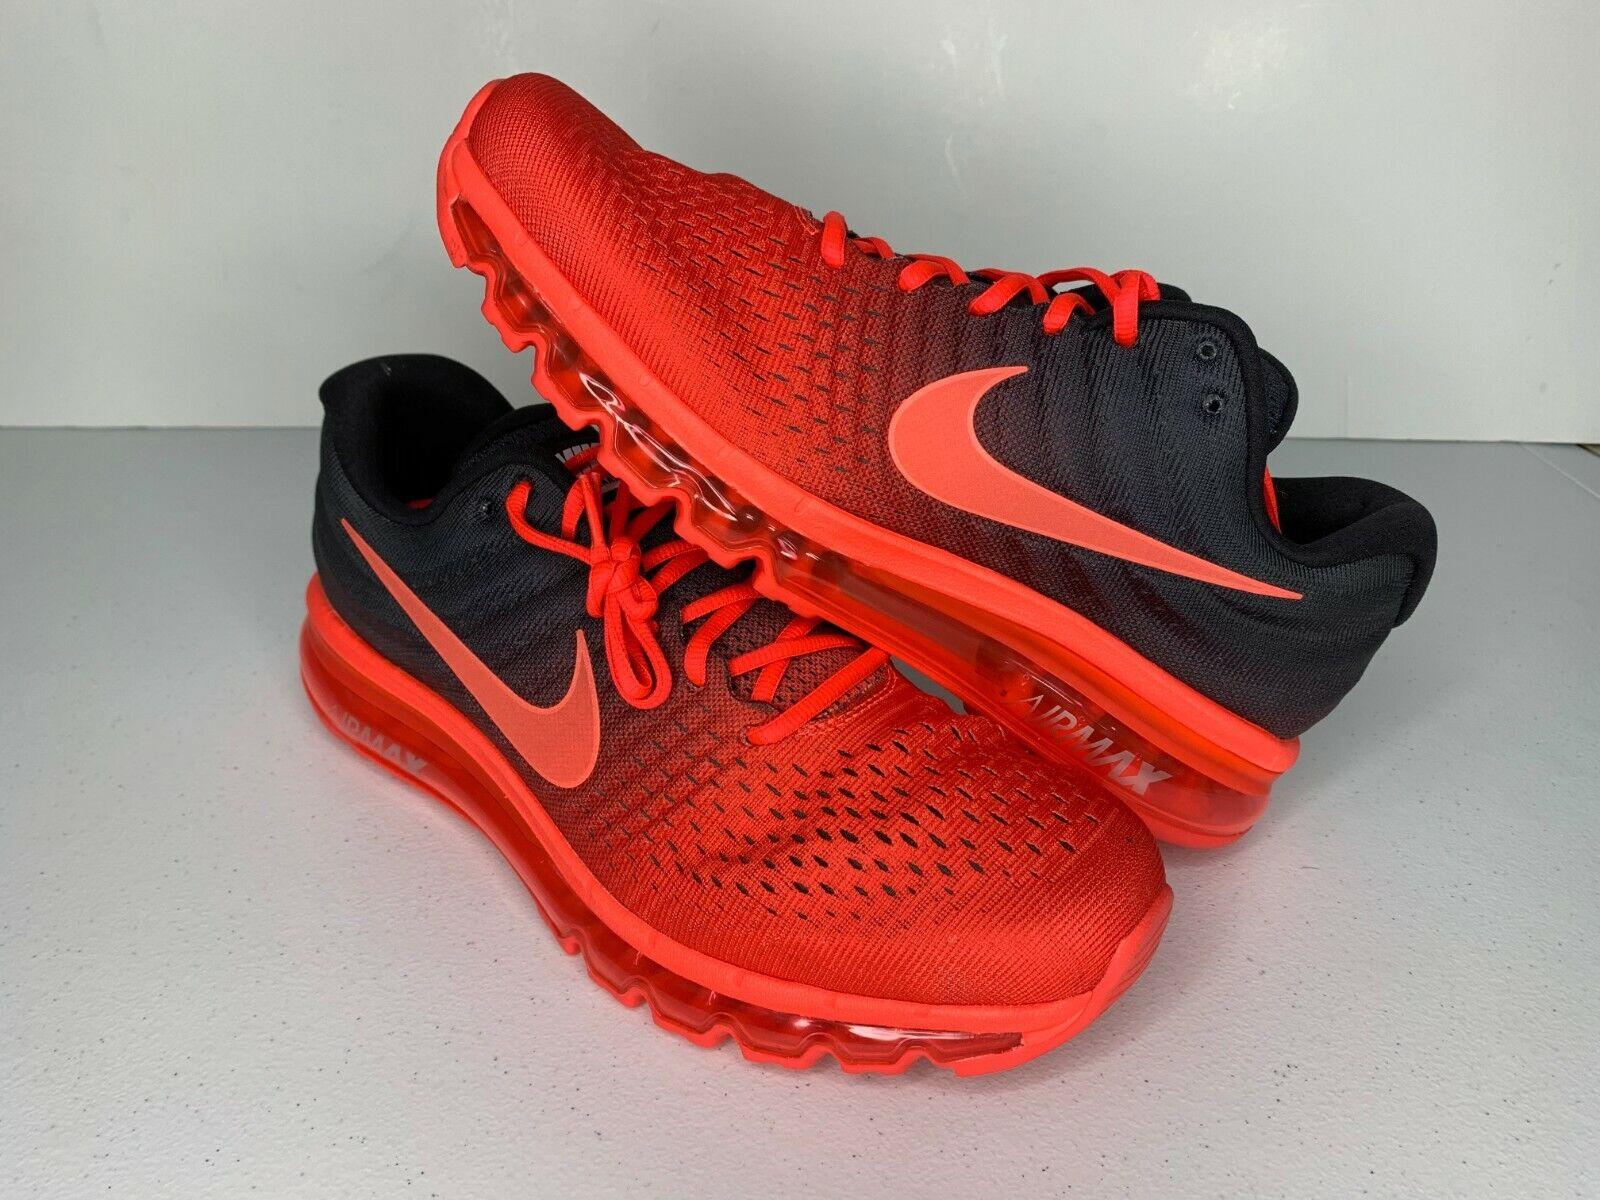 NEW Size 11 Nike Air Max 2017 BRIGHT CRIMSON BLACK Running shoes 849559-600 Men